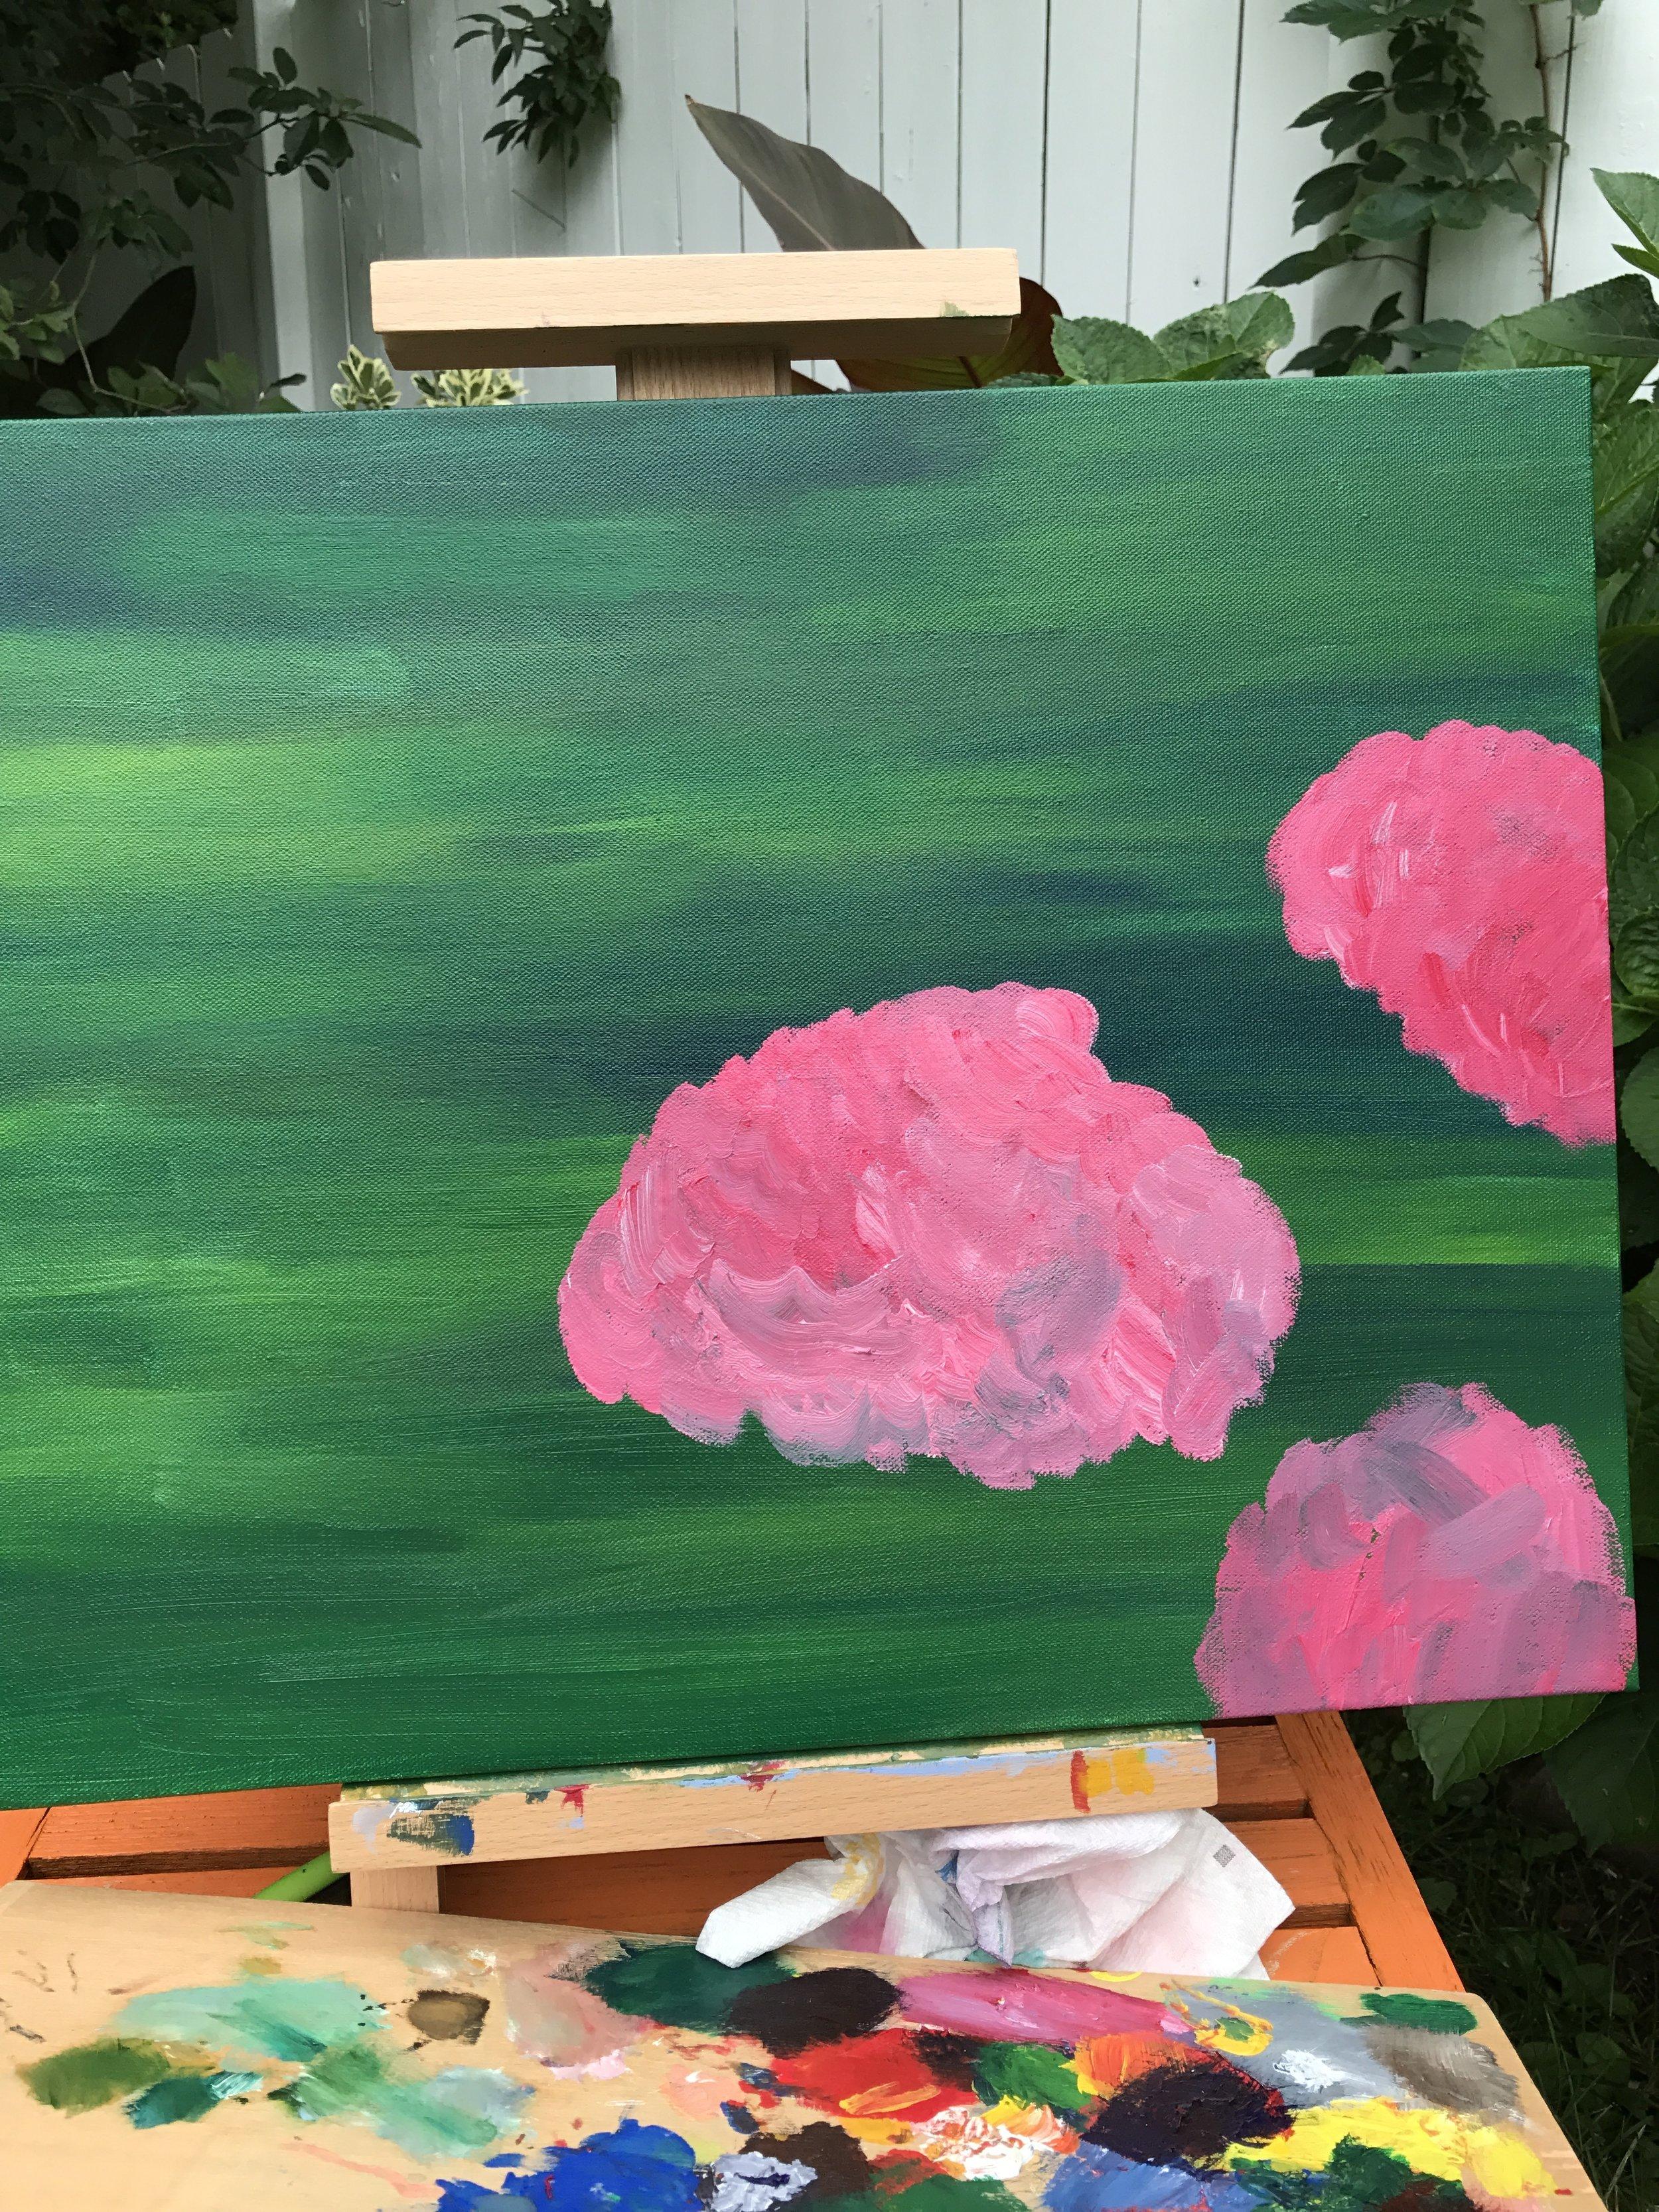 Painting  Dispassion  in my outdoor makeshift studio ©Francesca Bandino